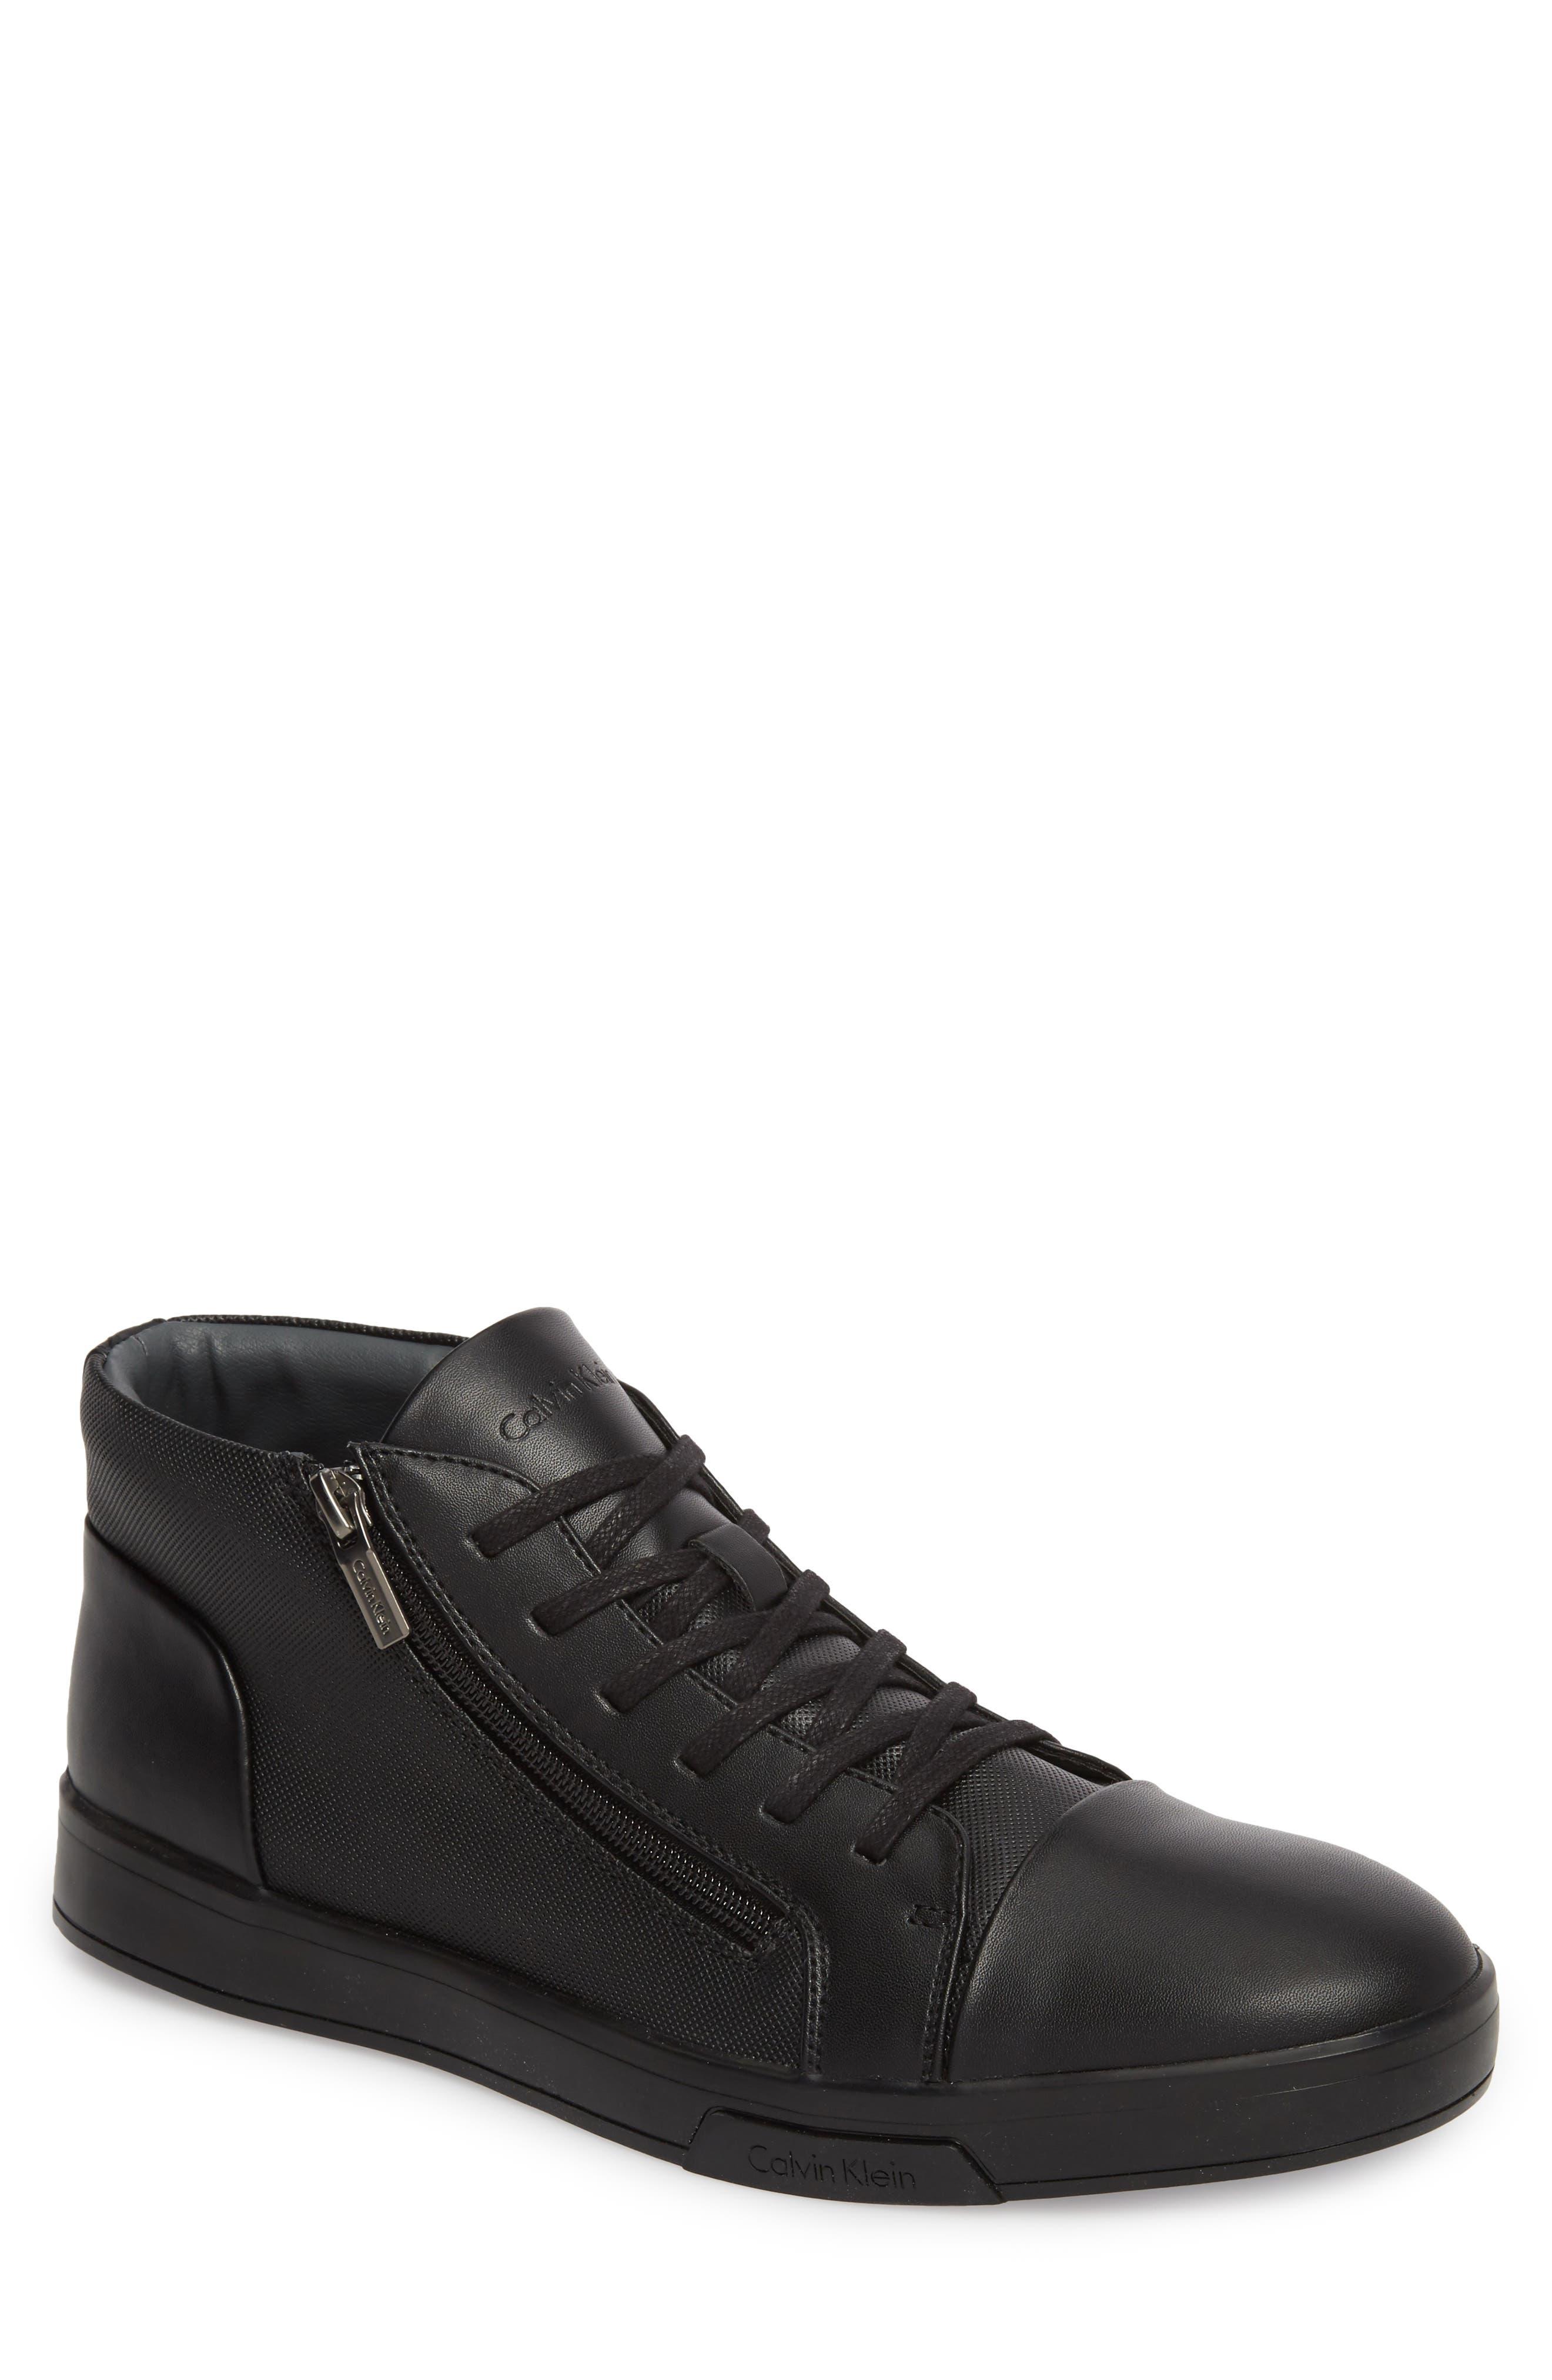 Bozeman High Top Sneaker,                         Main,                         color,